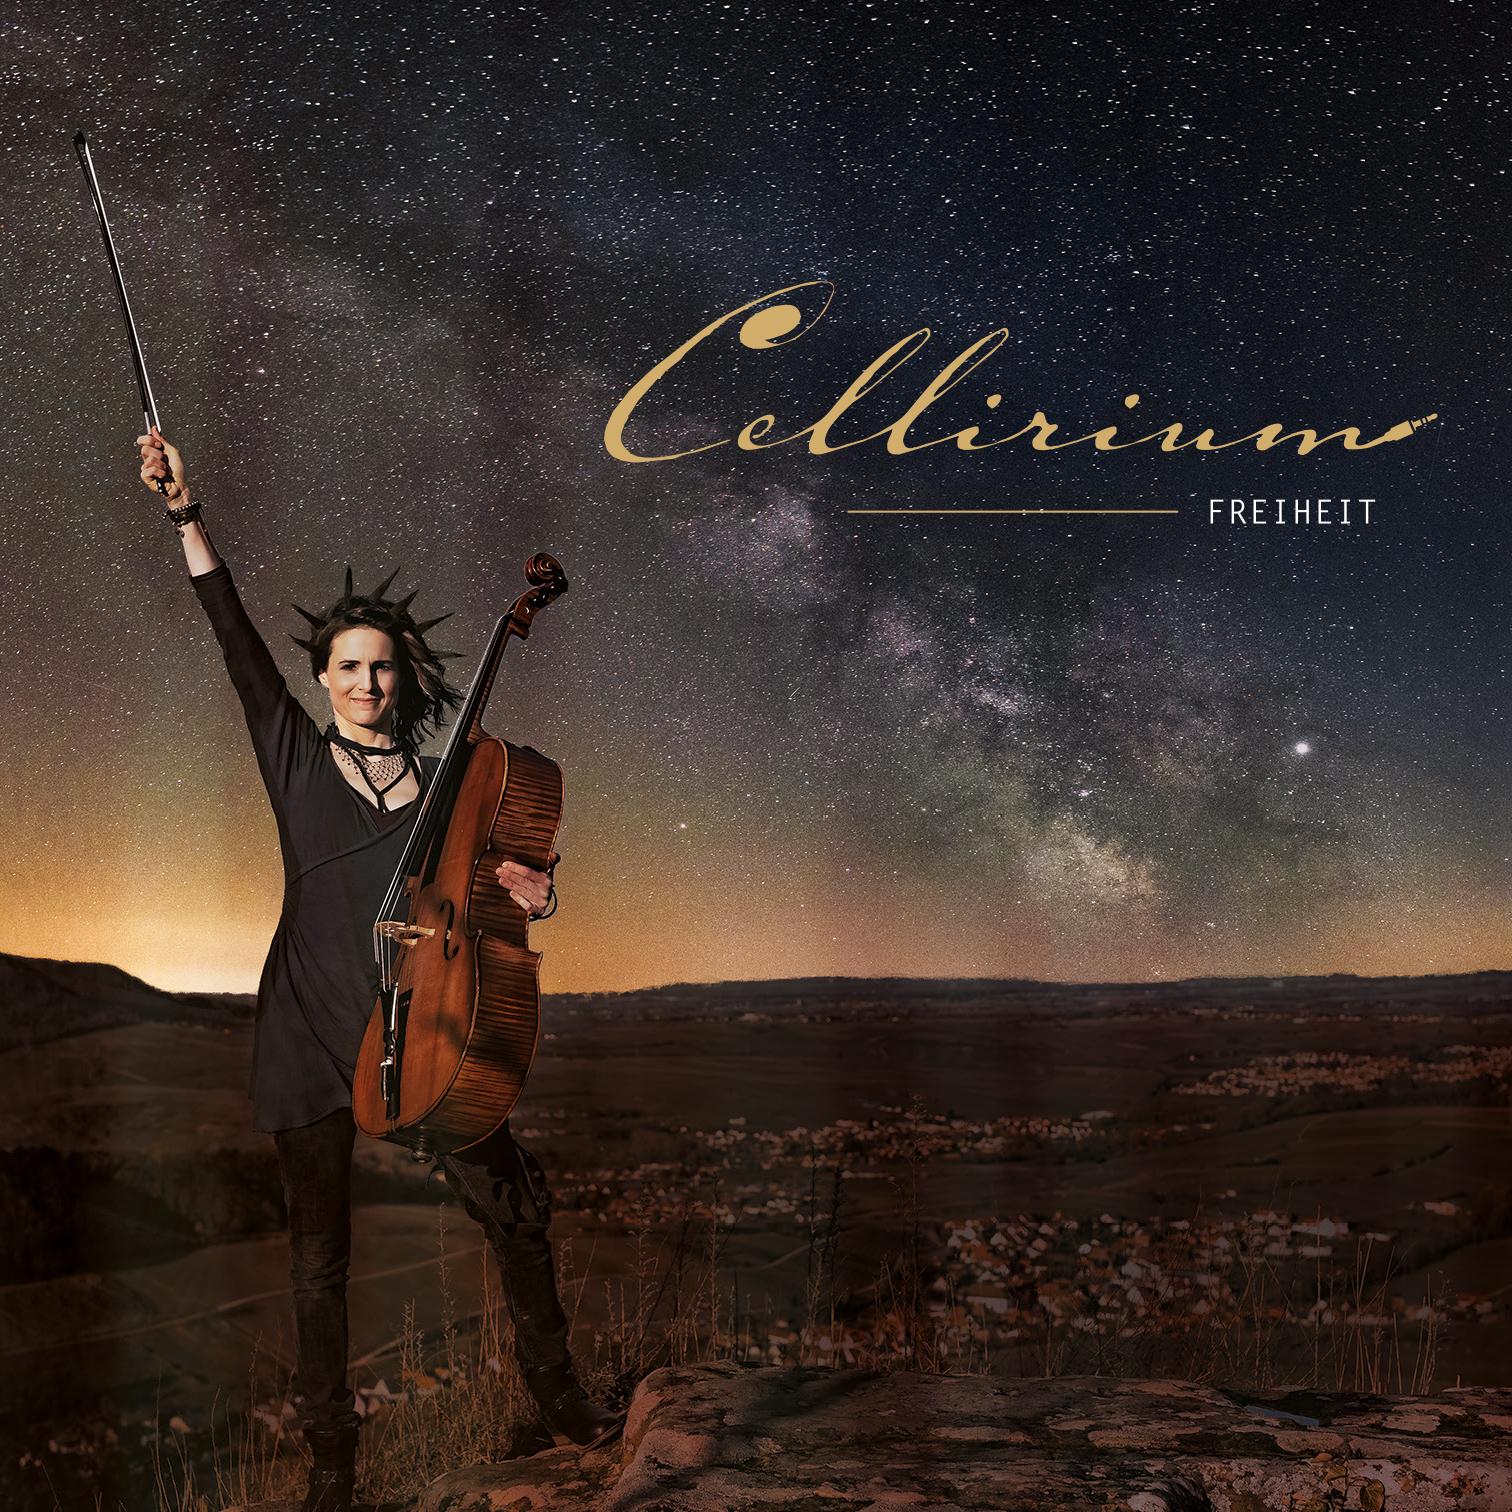 Cellirium - Freiheit